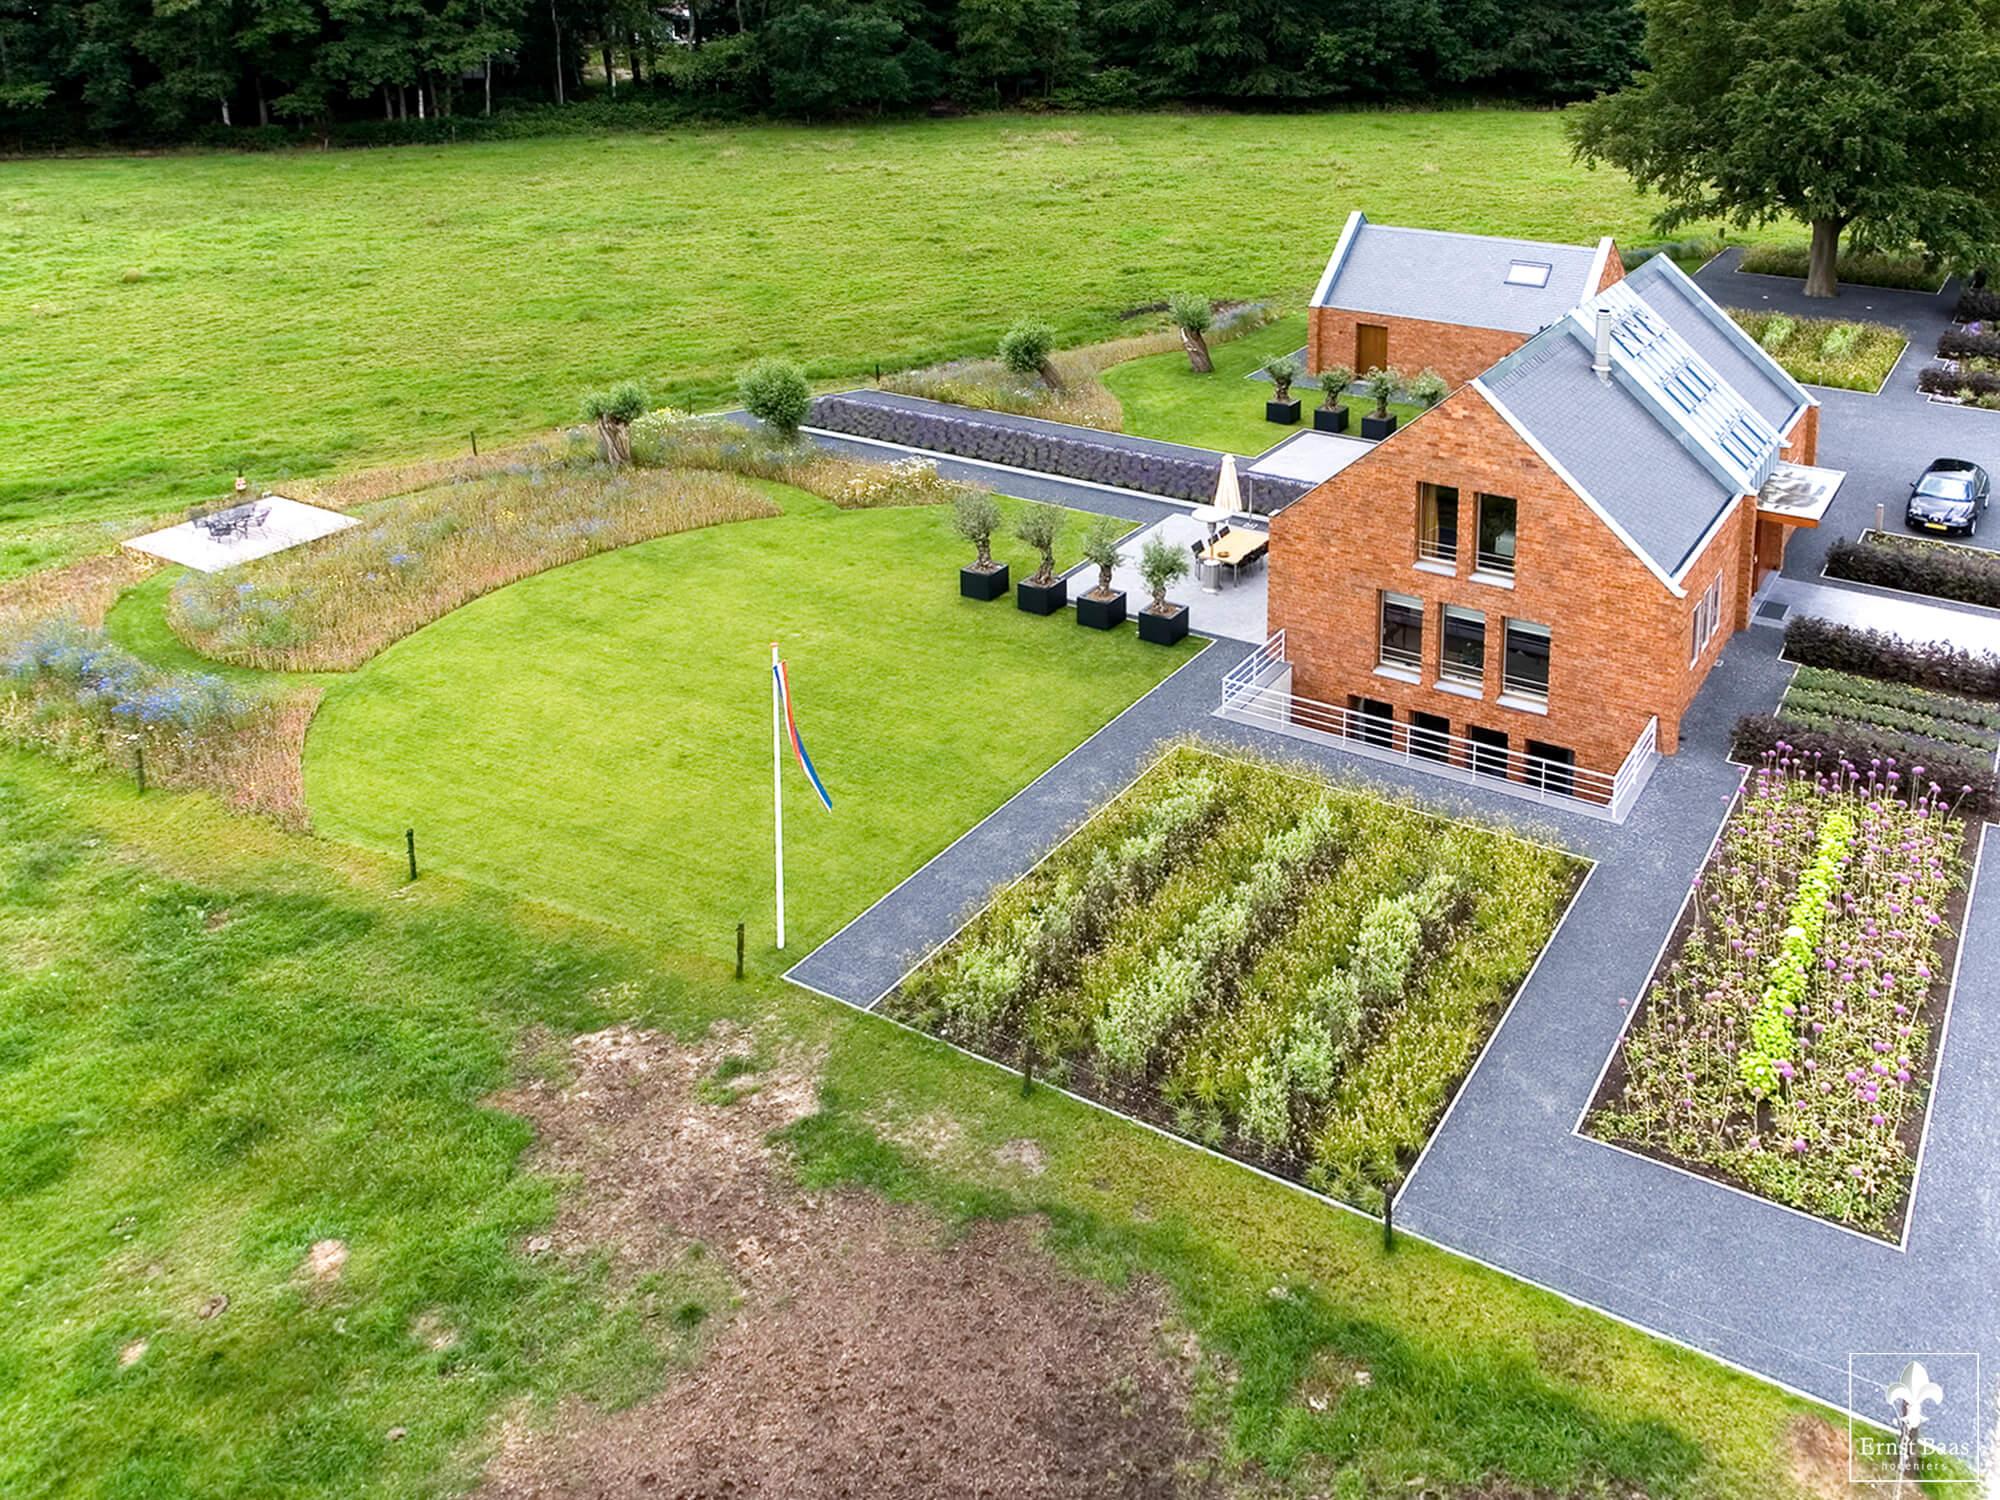 Grote Moderne Tuin : Vrijstaande woning met moderne tuin ernst baas hoveniersbedrijf in